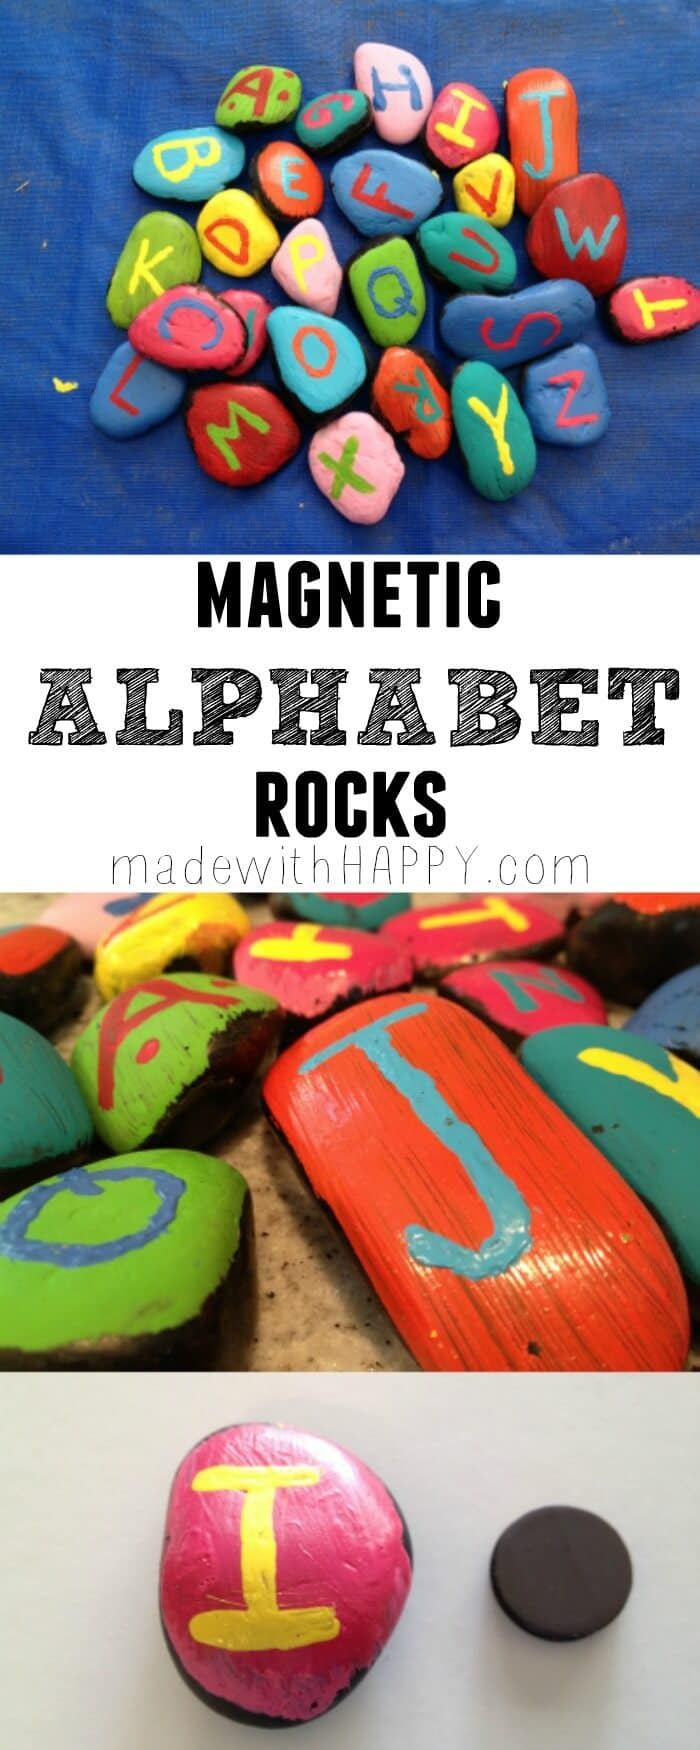 magnetic-alphabet-rocks